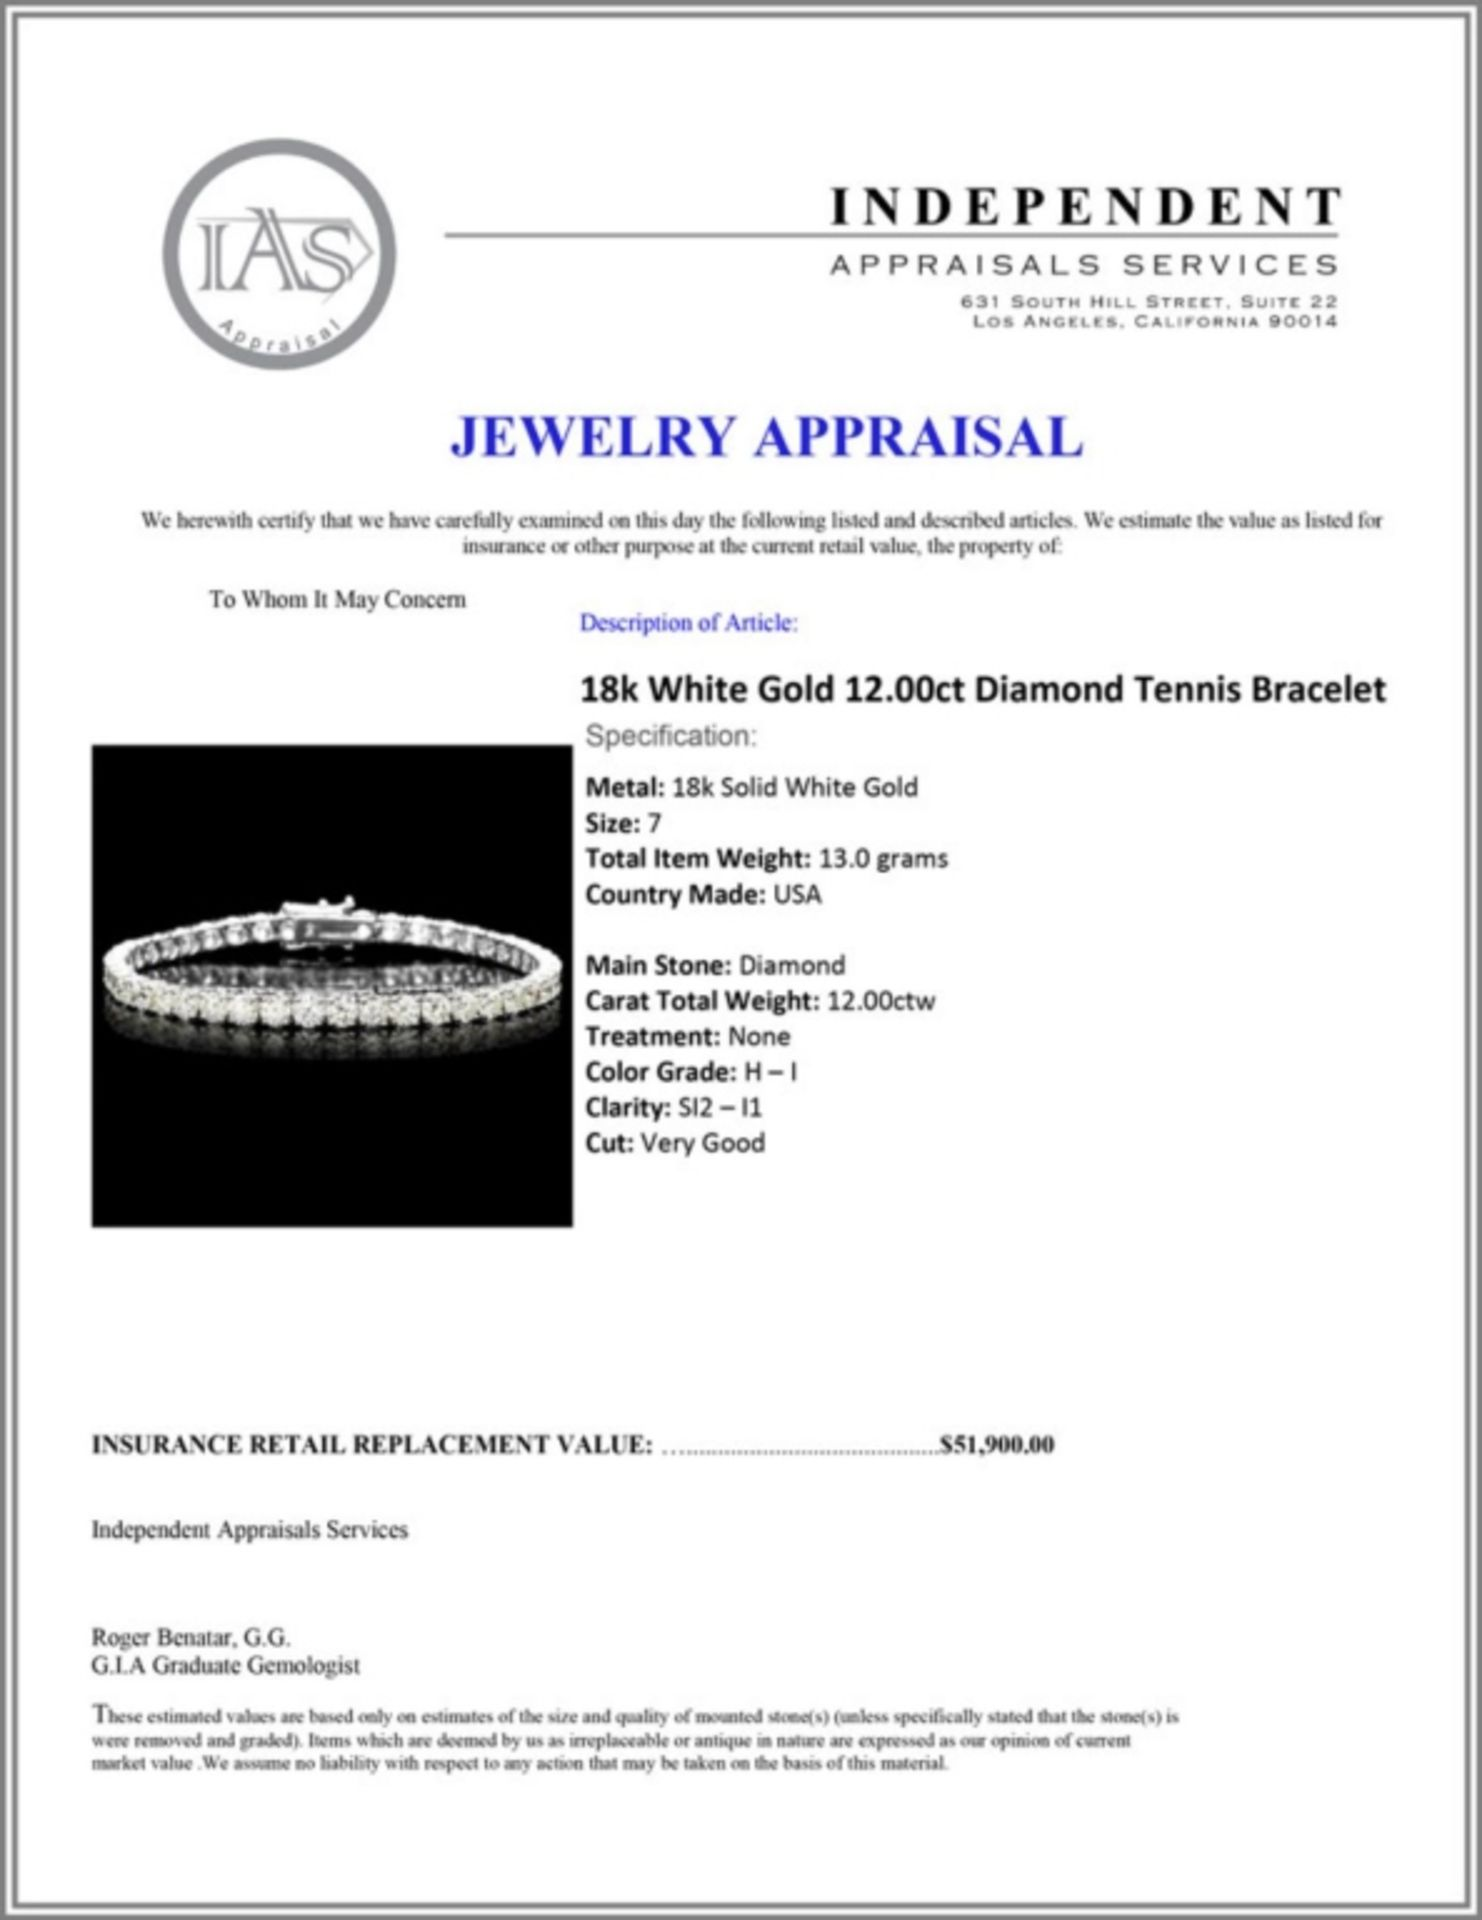 ^18k White Gold 12.00ct Diamond Tennis Bracelet - Image 4 of 4